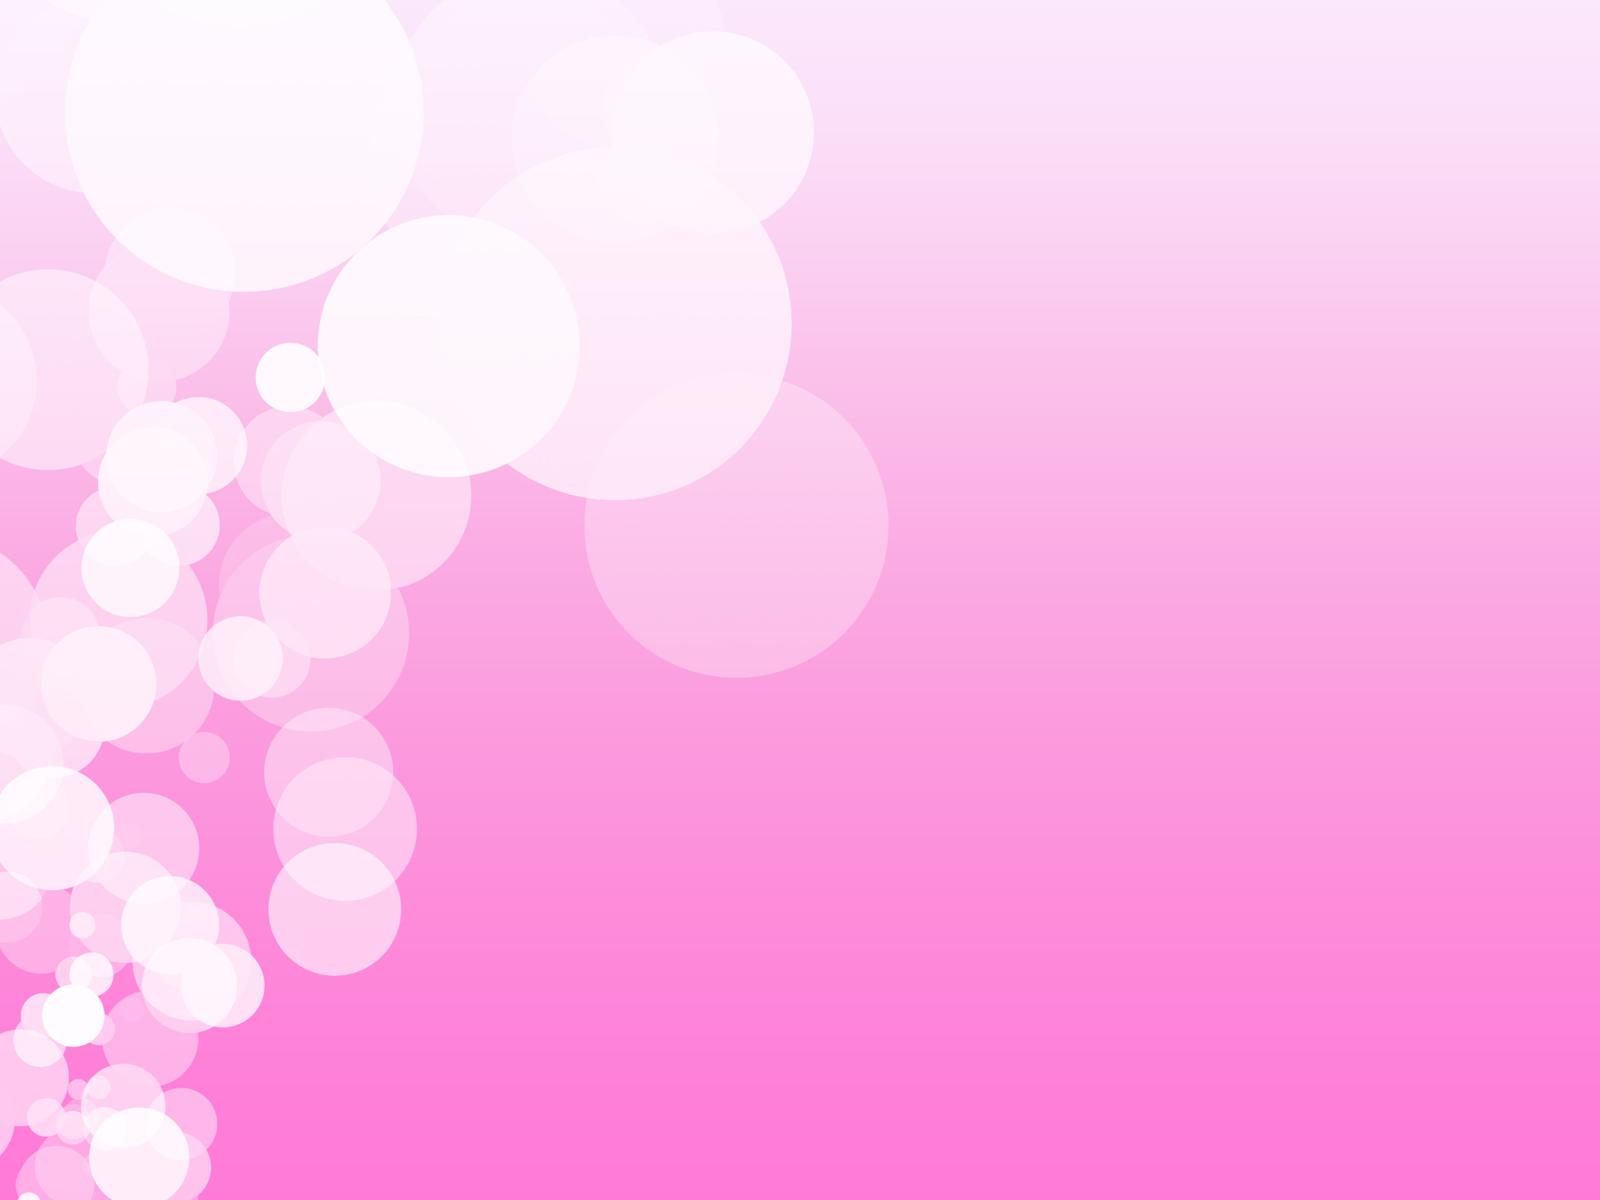 pink-powerpoint-bubbles_223385.jpg